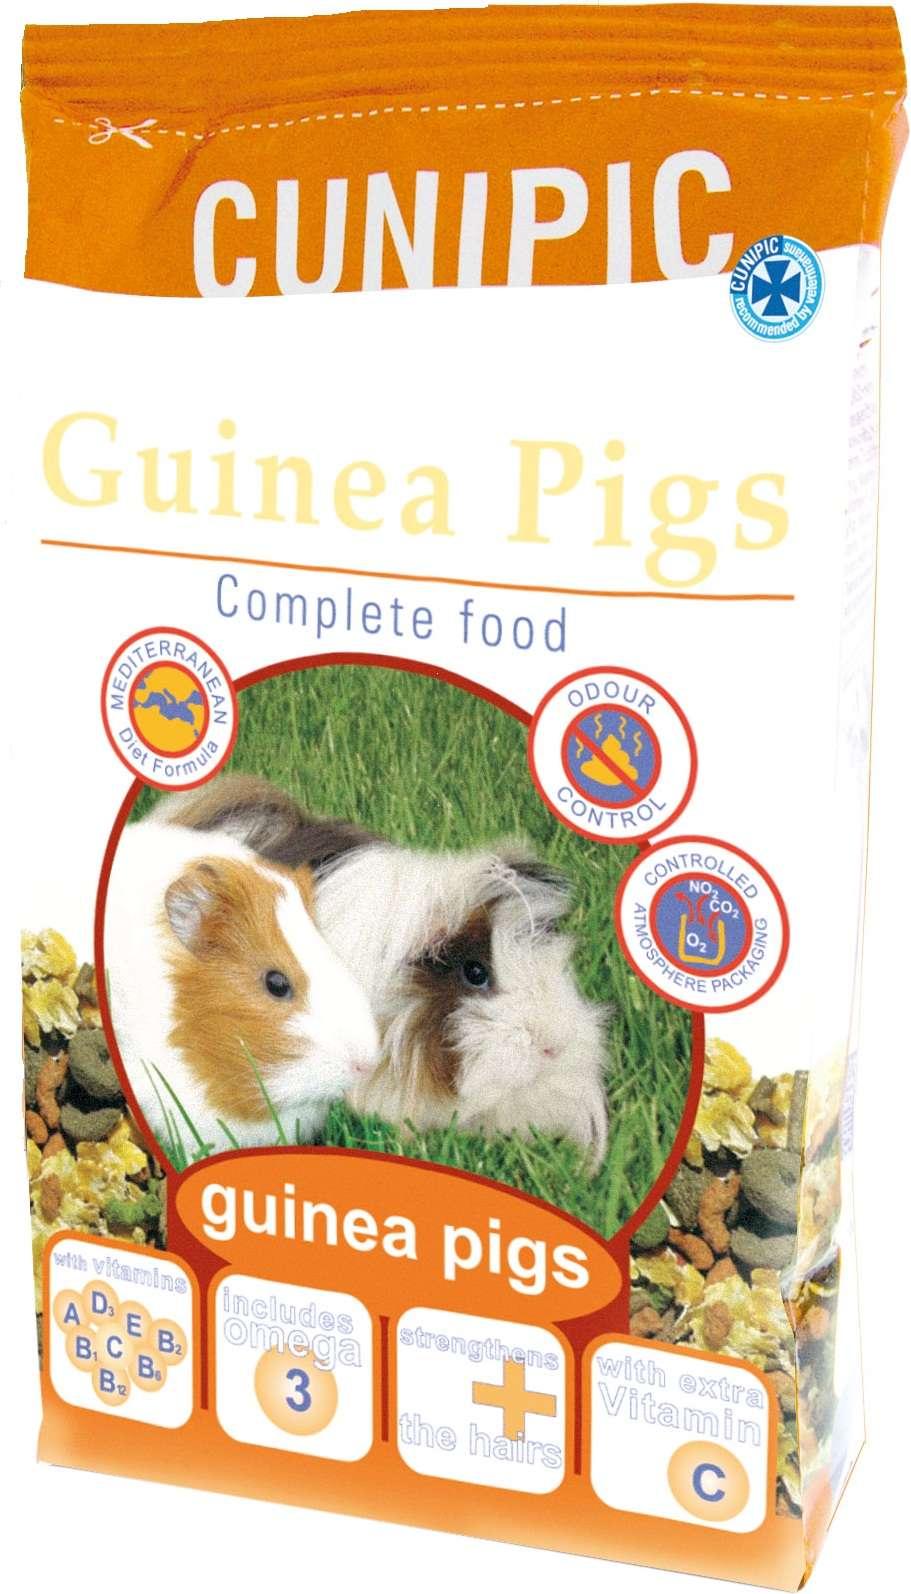 Cunipic Guinea pigs